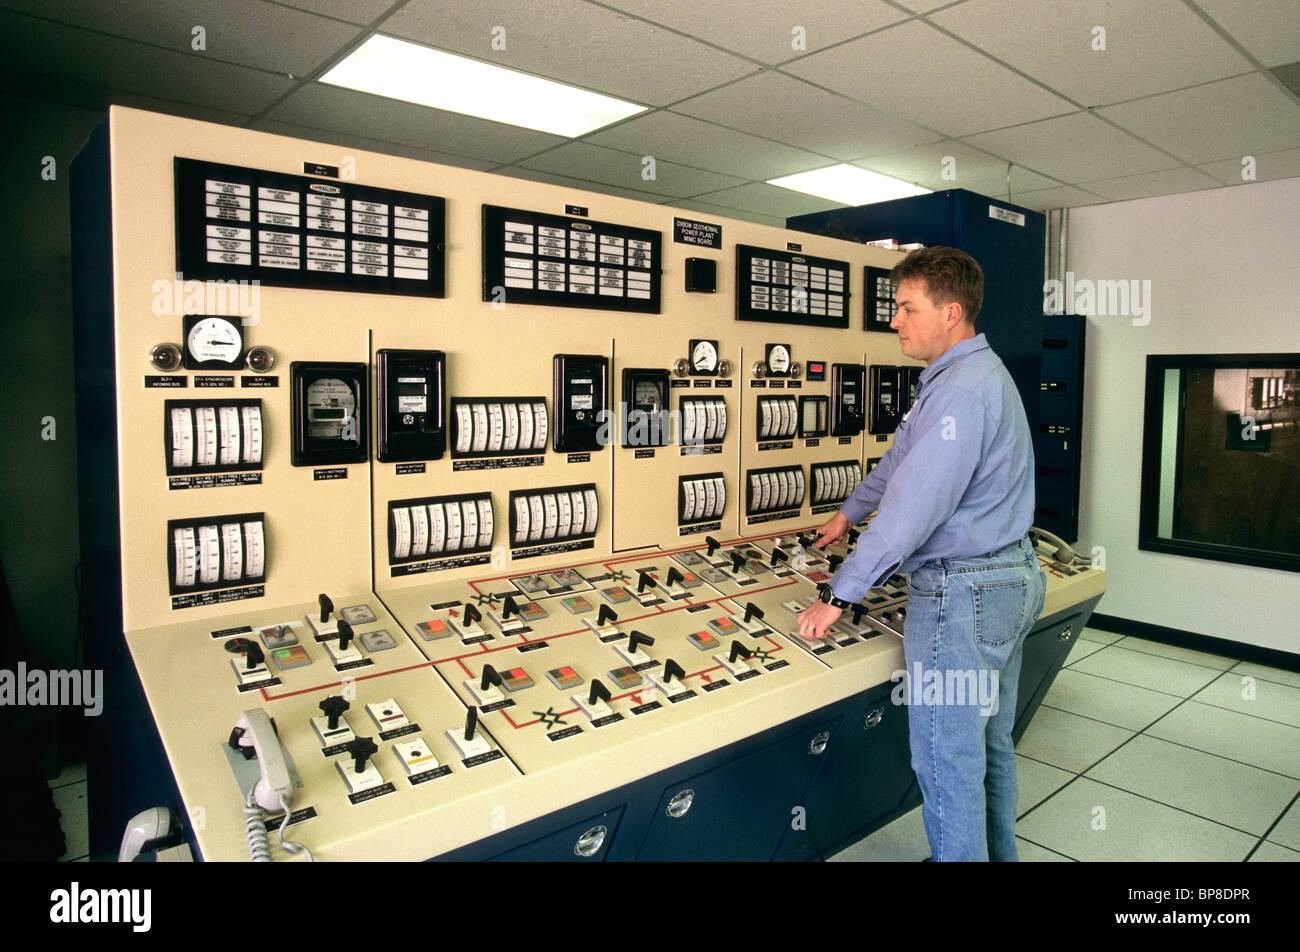 Geothermie-Kraftwerk, Operator am Leitstand, Stockbild